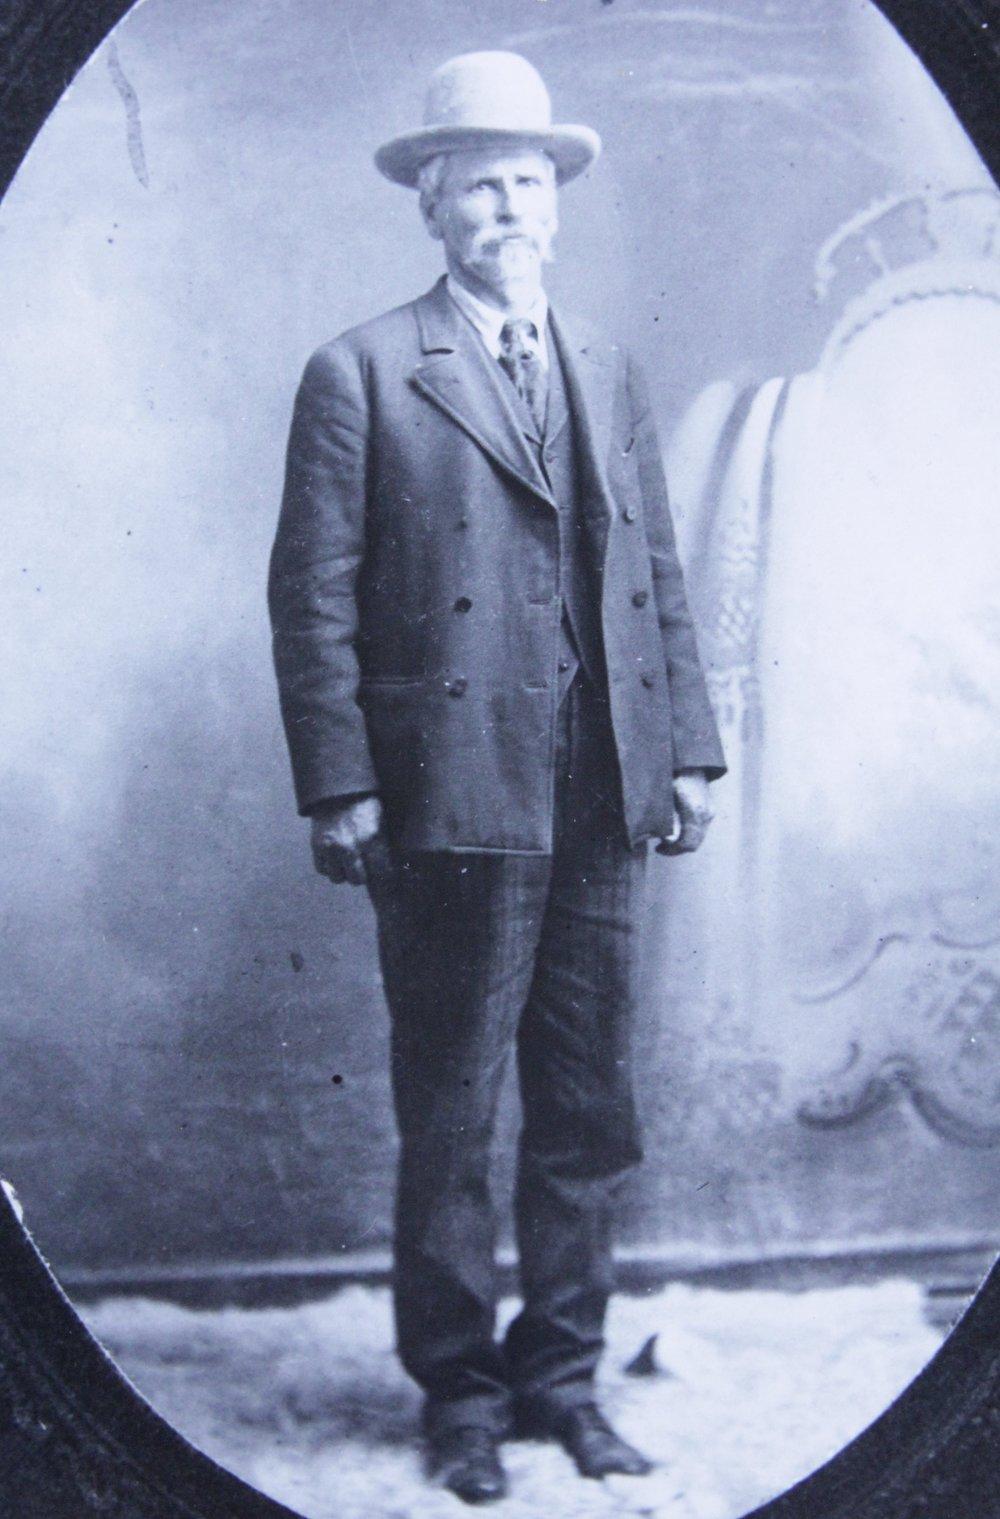 Doc Middleton, 1909 in Crawford, NE